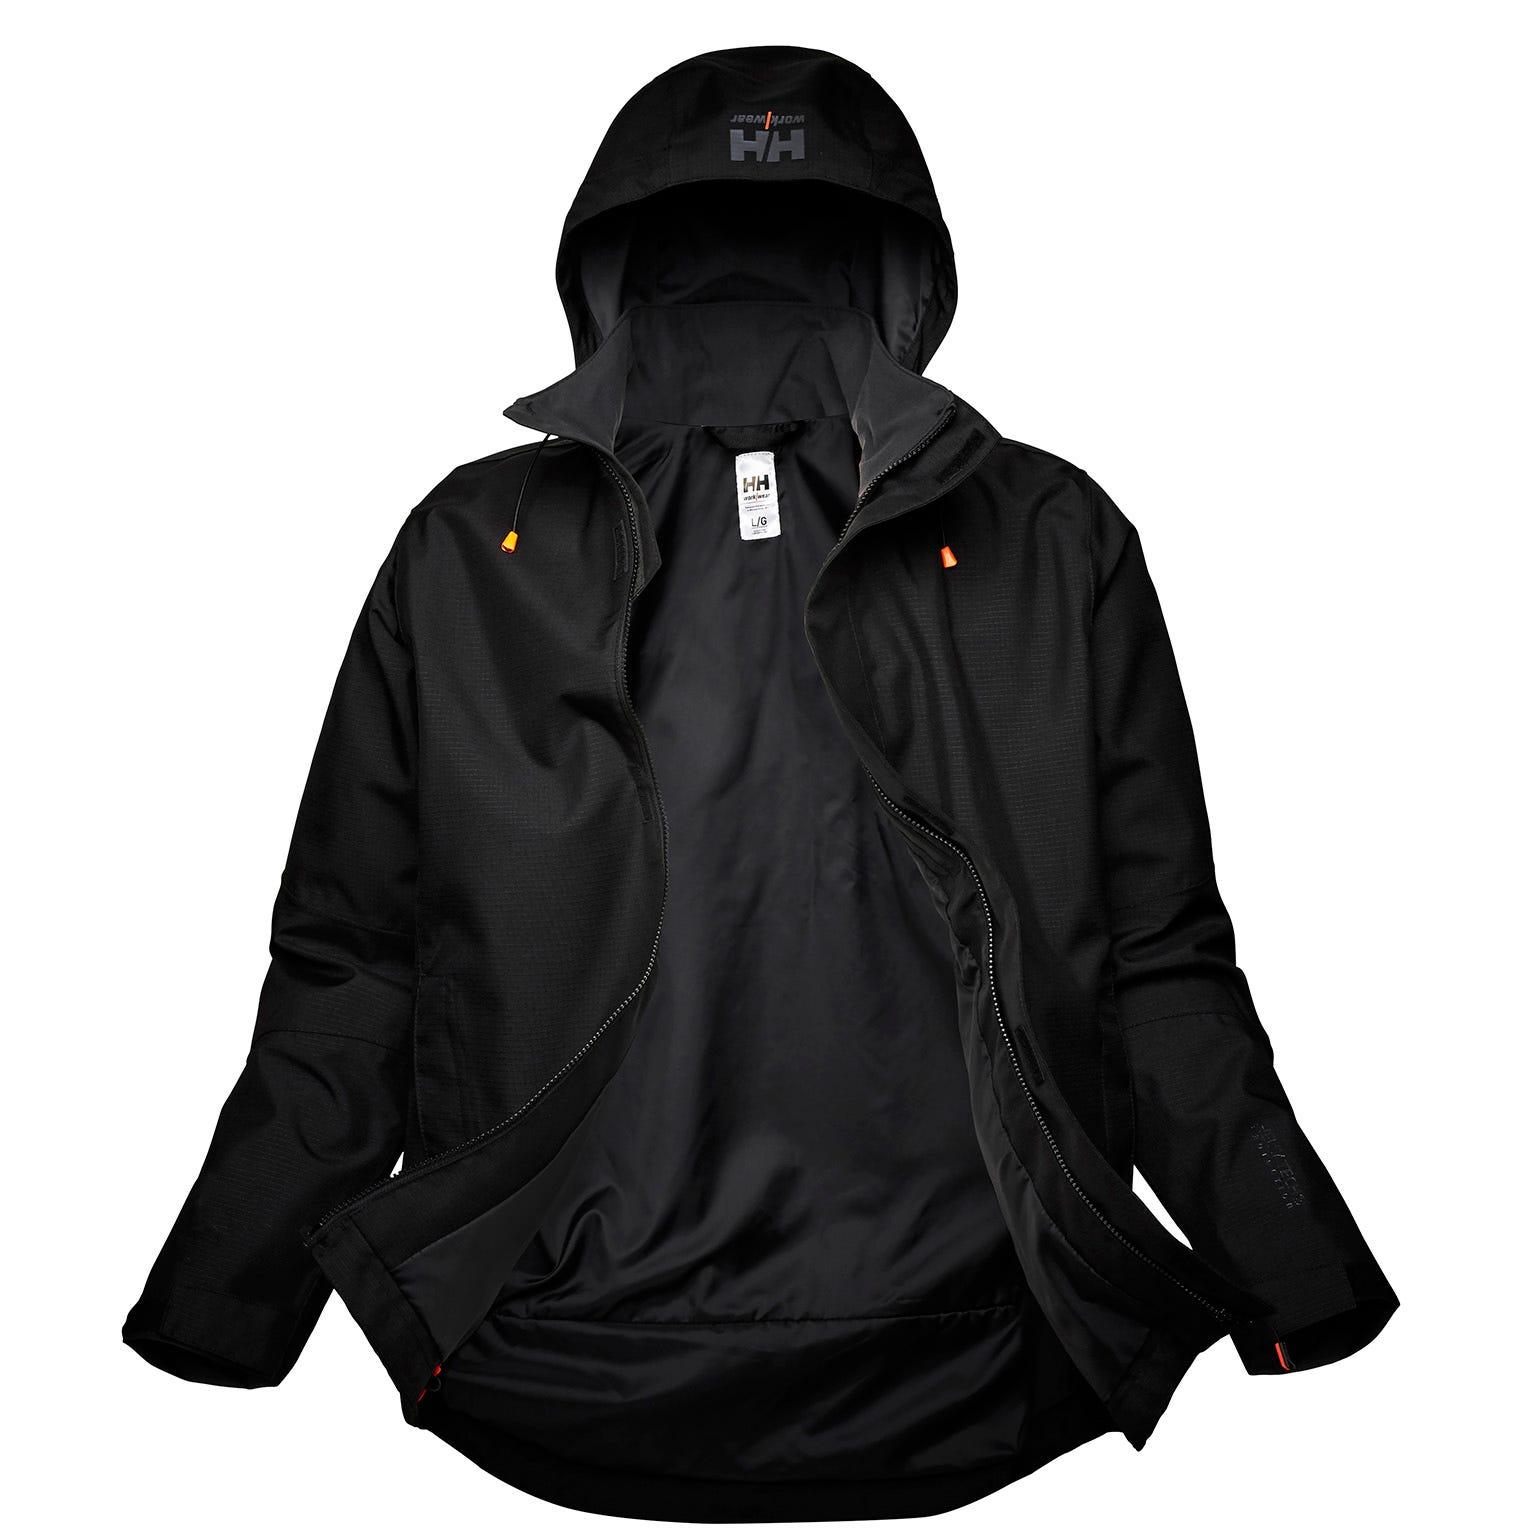 HH Workwear Workwear Oxford Waterproof Shell Jacket Black XXL